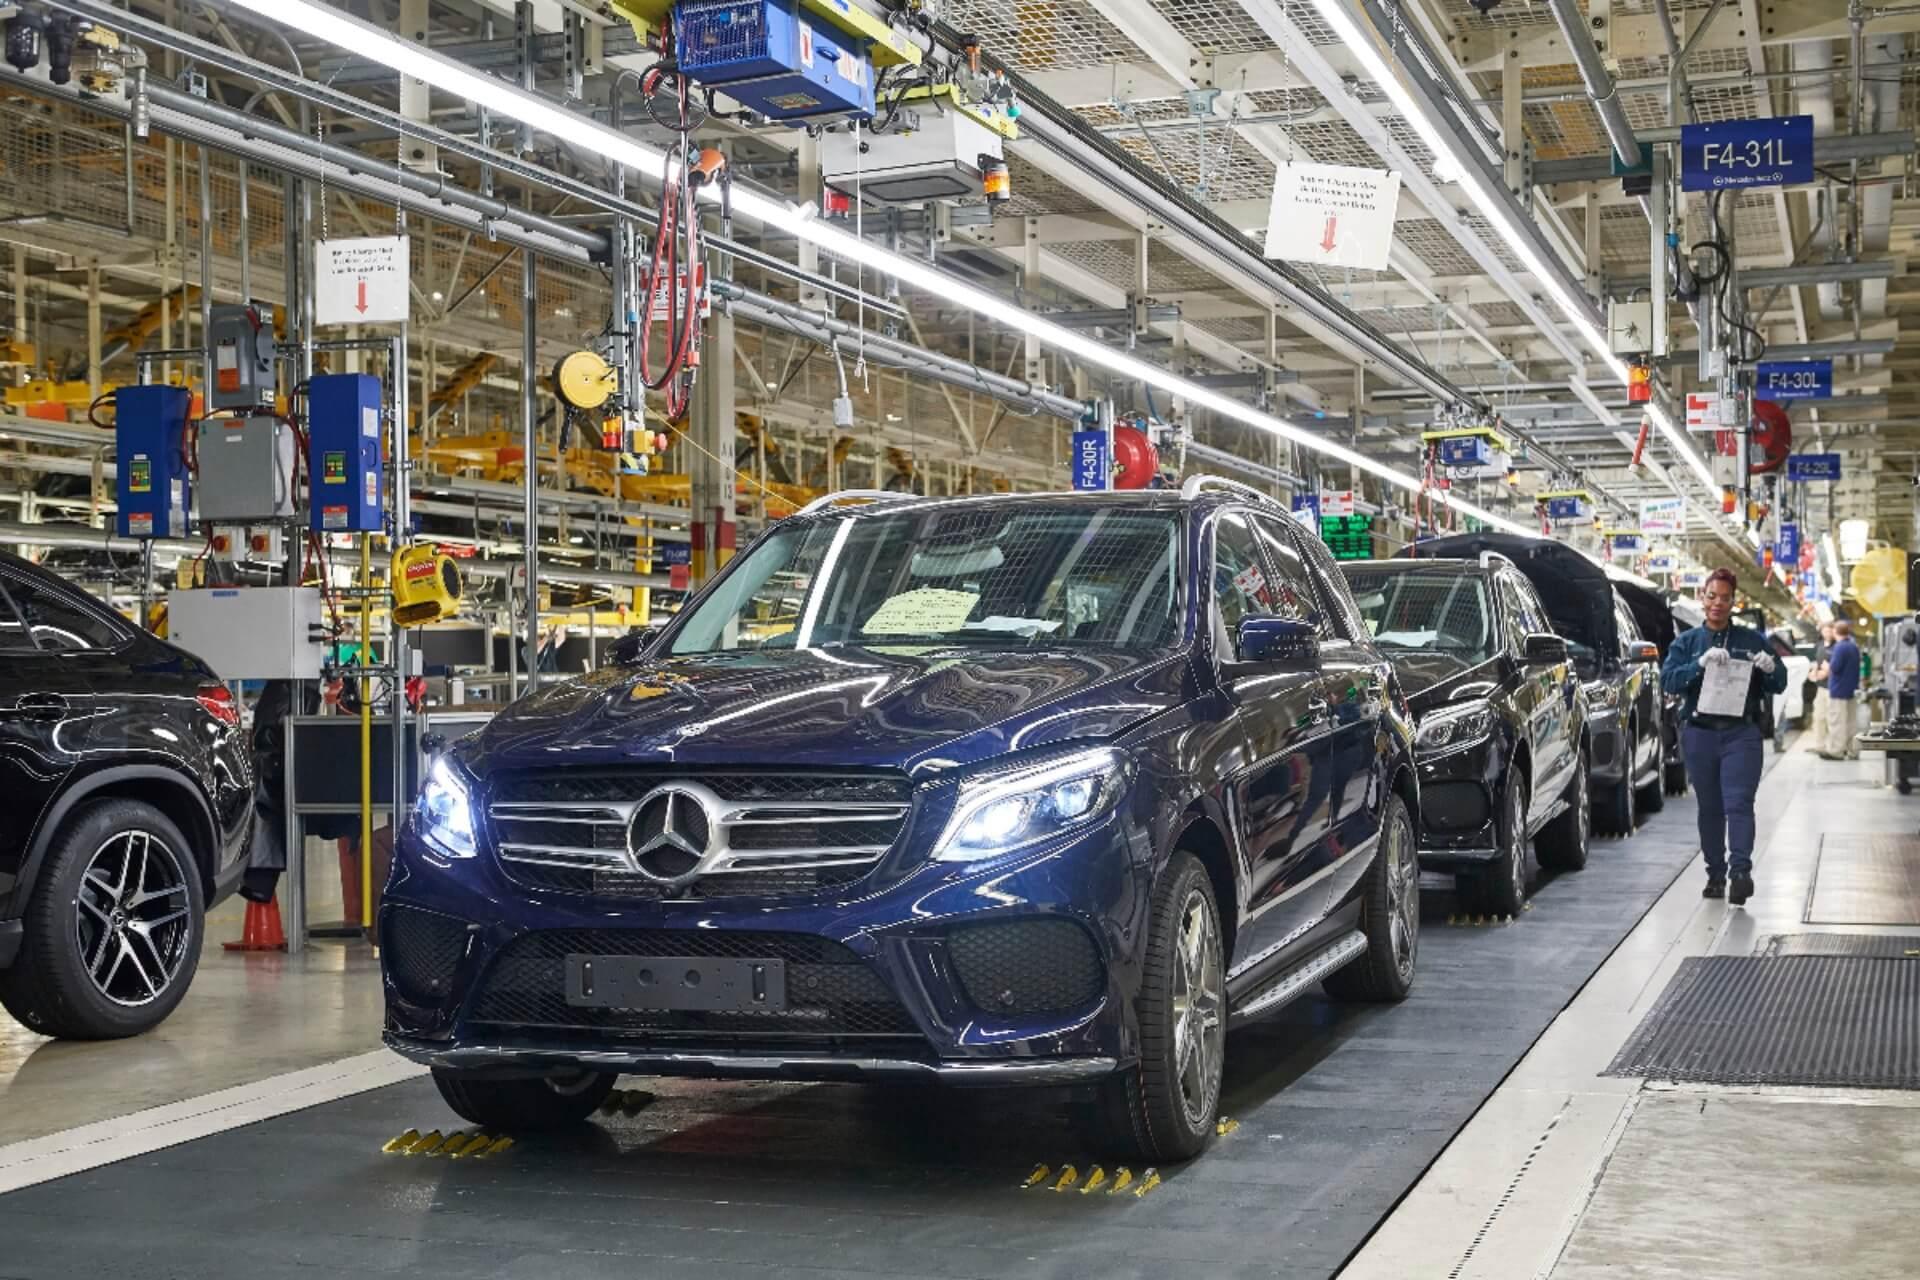 Производство автомобилей Mercedes-Benz на заводе вТускалузе